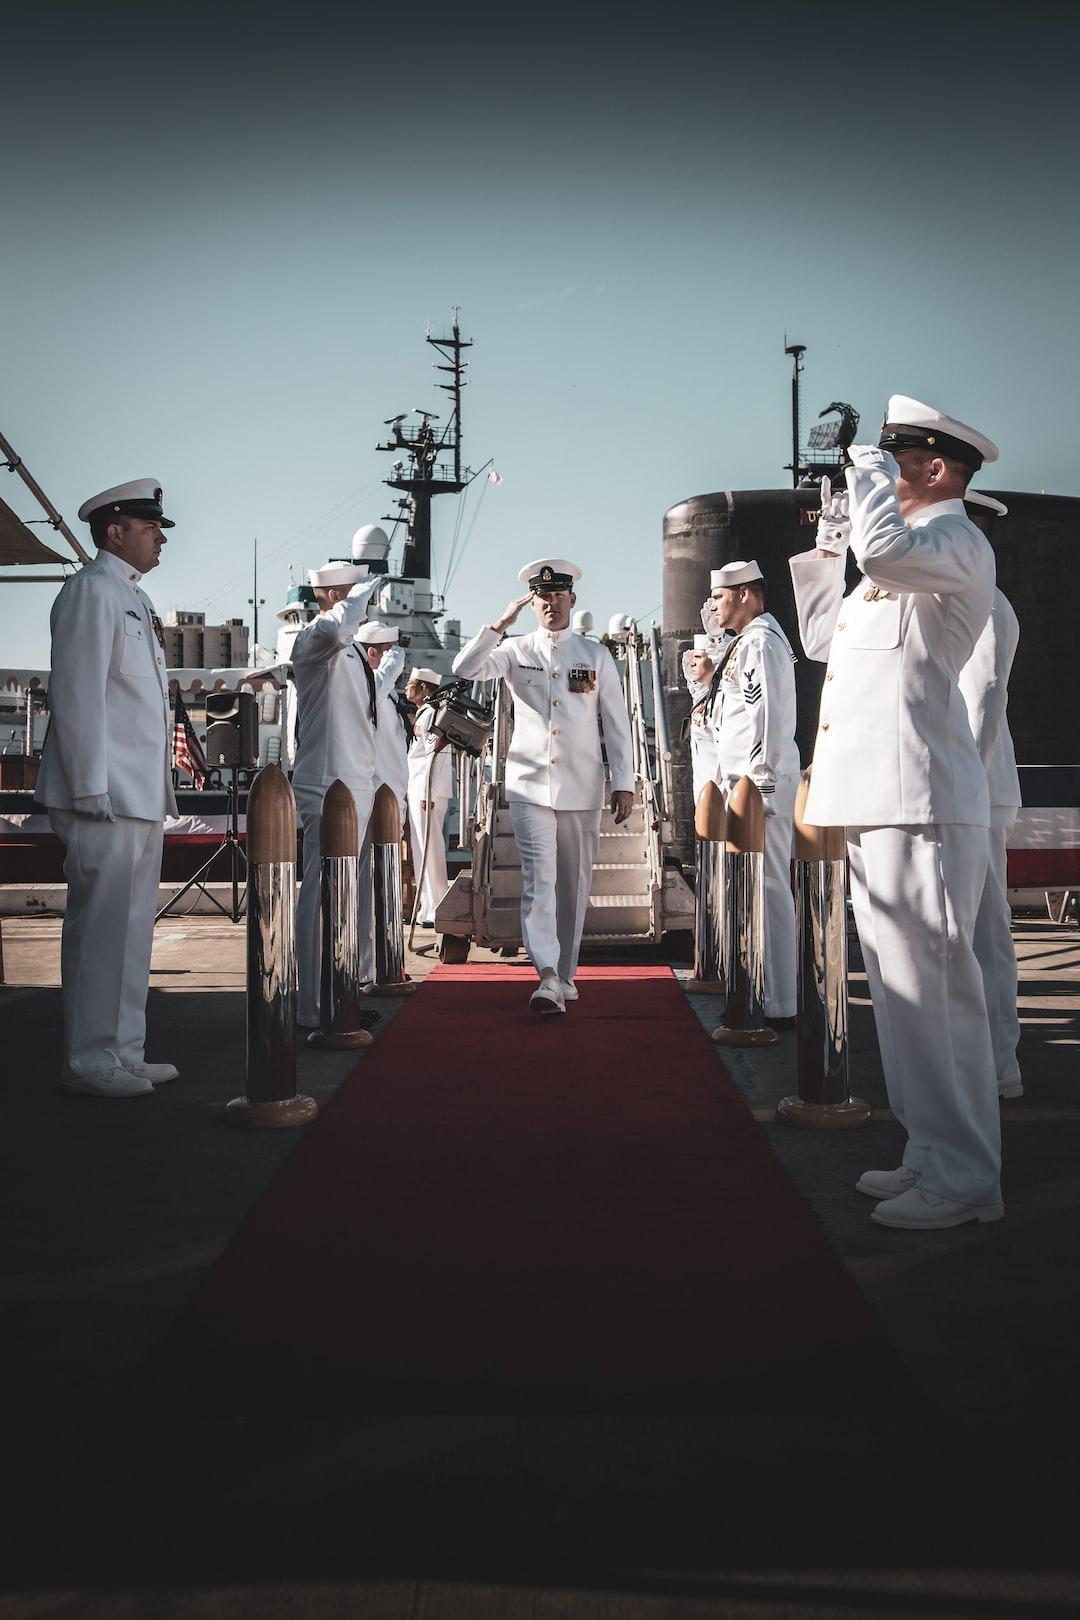 Navy Wallpapers Free Hd Download 500 Hq Unsplash